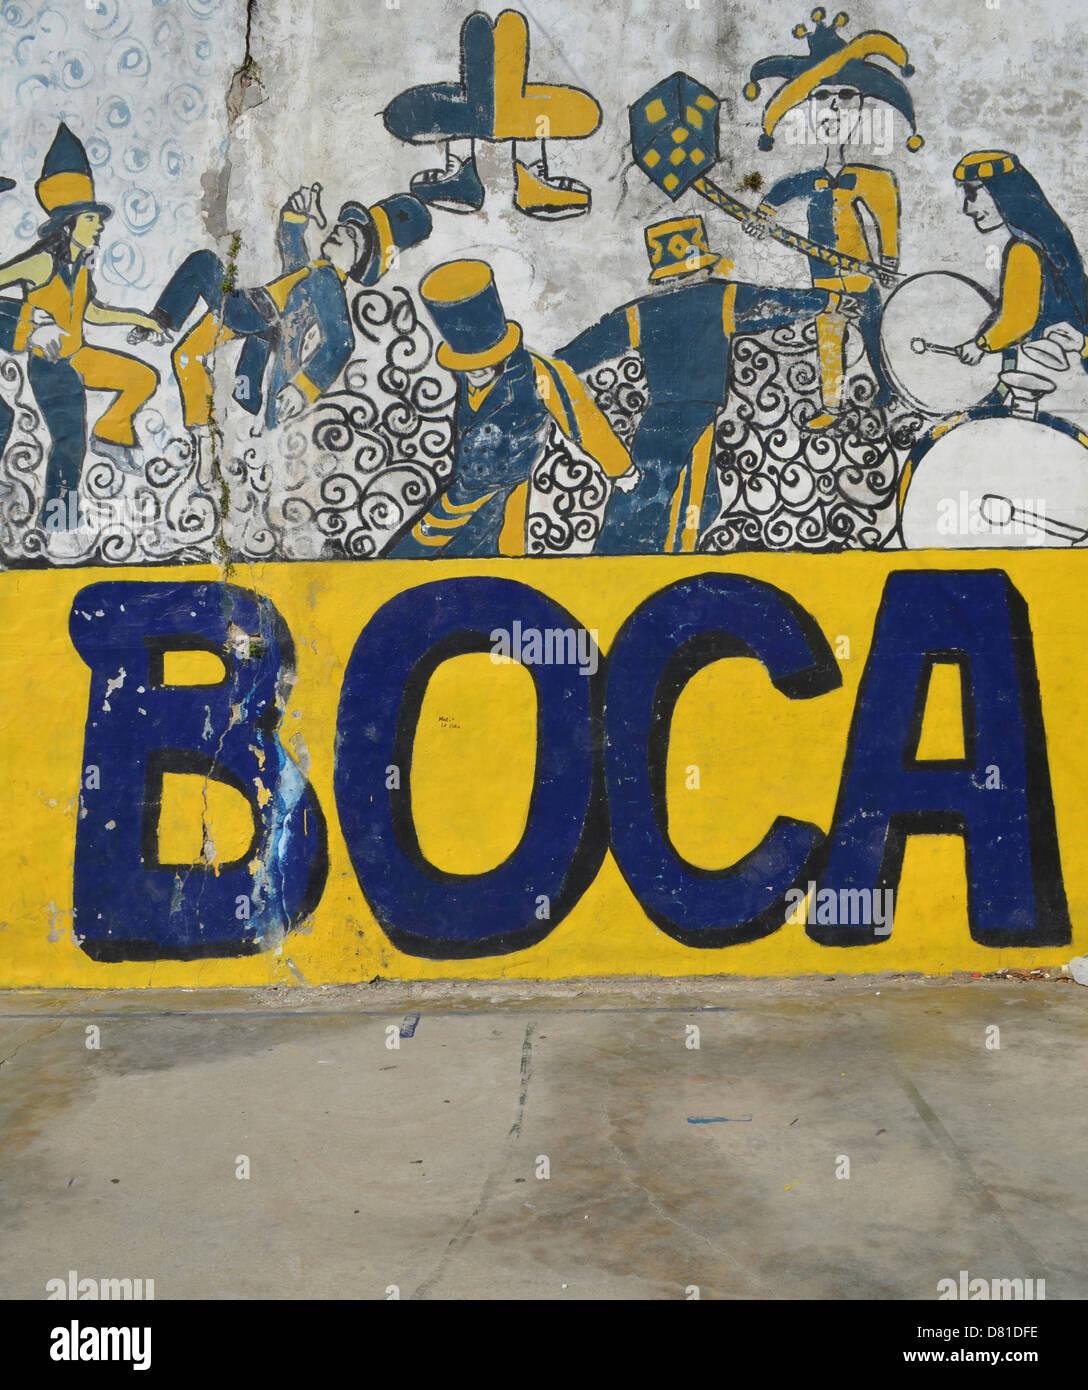 Colourful graffiti and wall art in a playground in the La Boca Stock ...